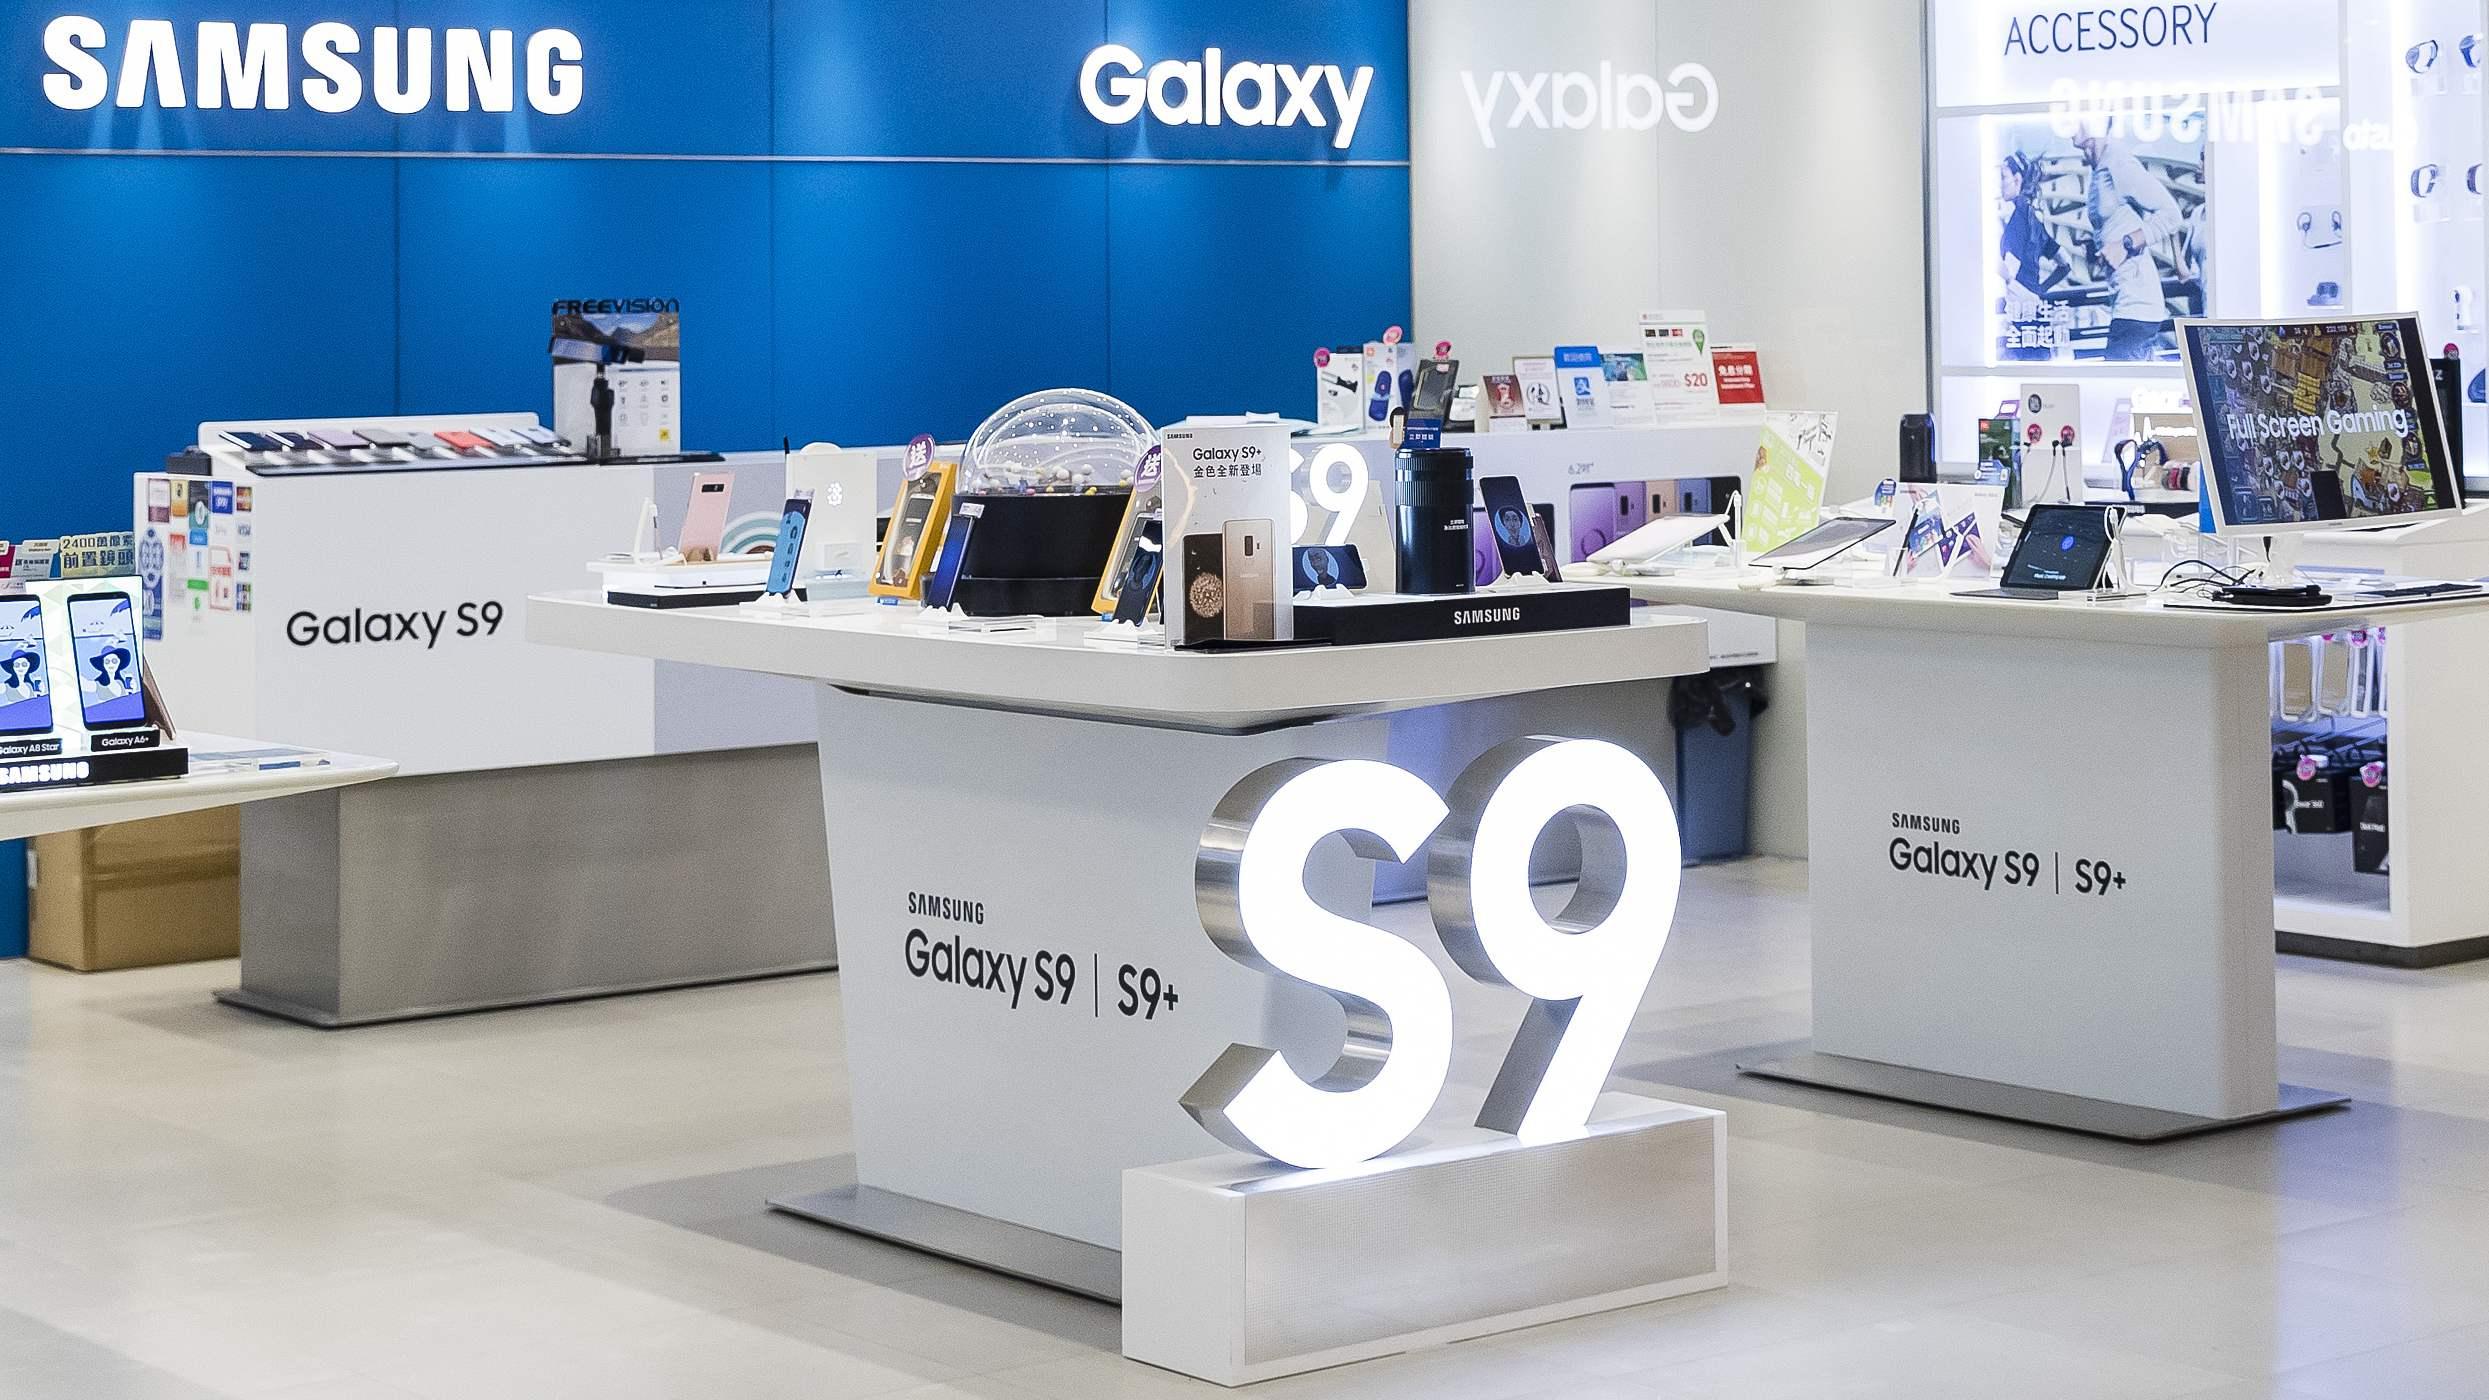 Samsung to invest $22 billion on new technology